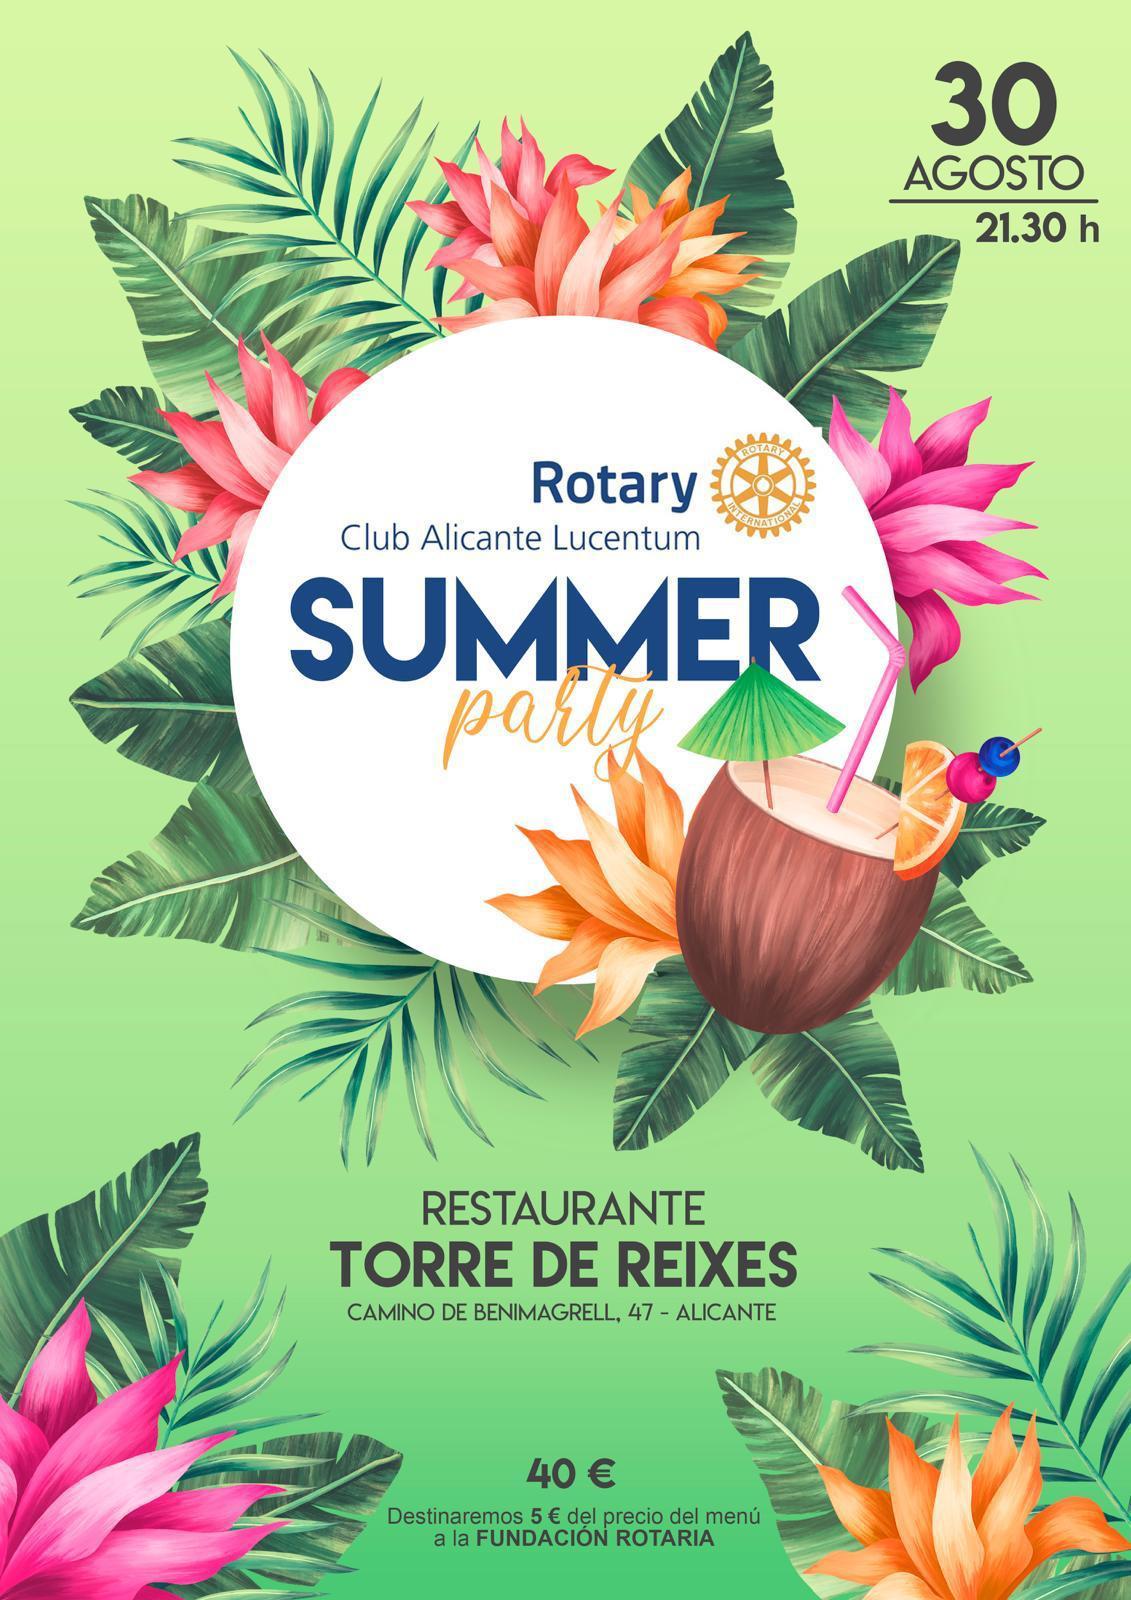 fiesta rotary club lucentum